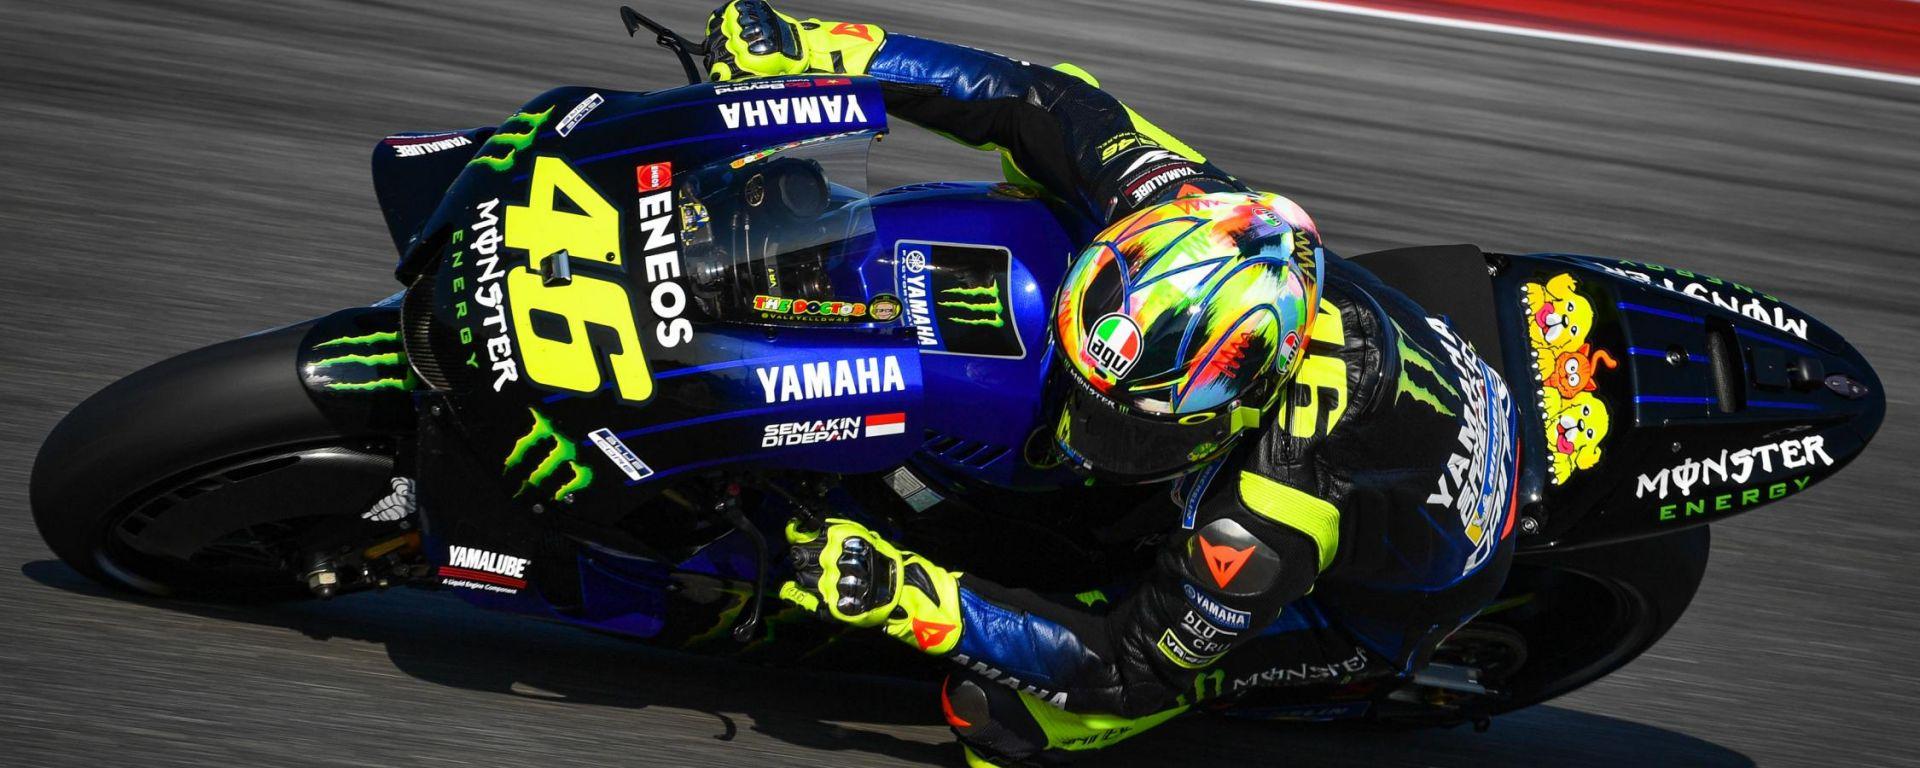 Test MotoGP Misano 2019, Valentino Rossi (Yamaha)